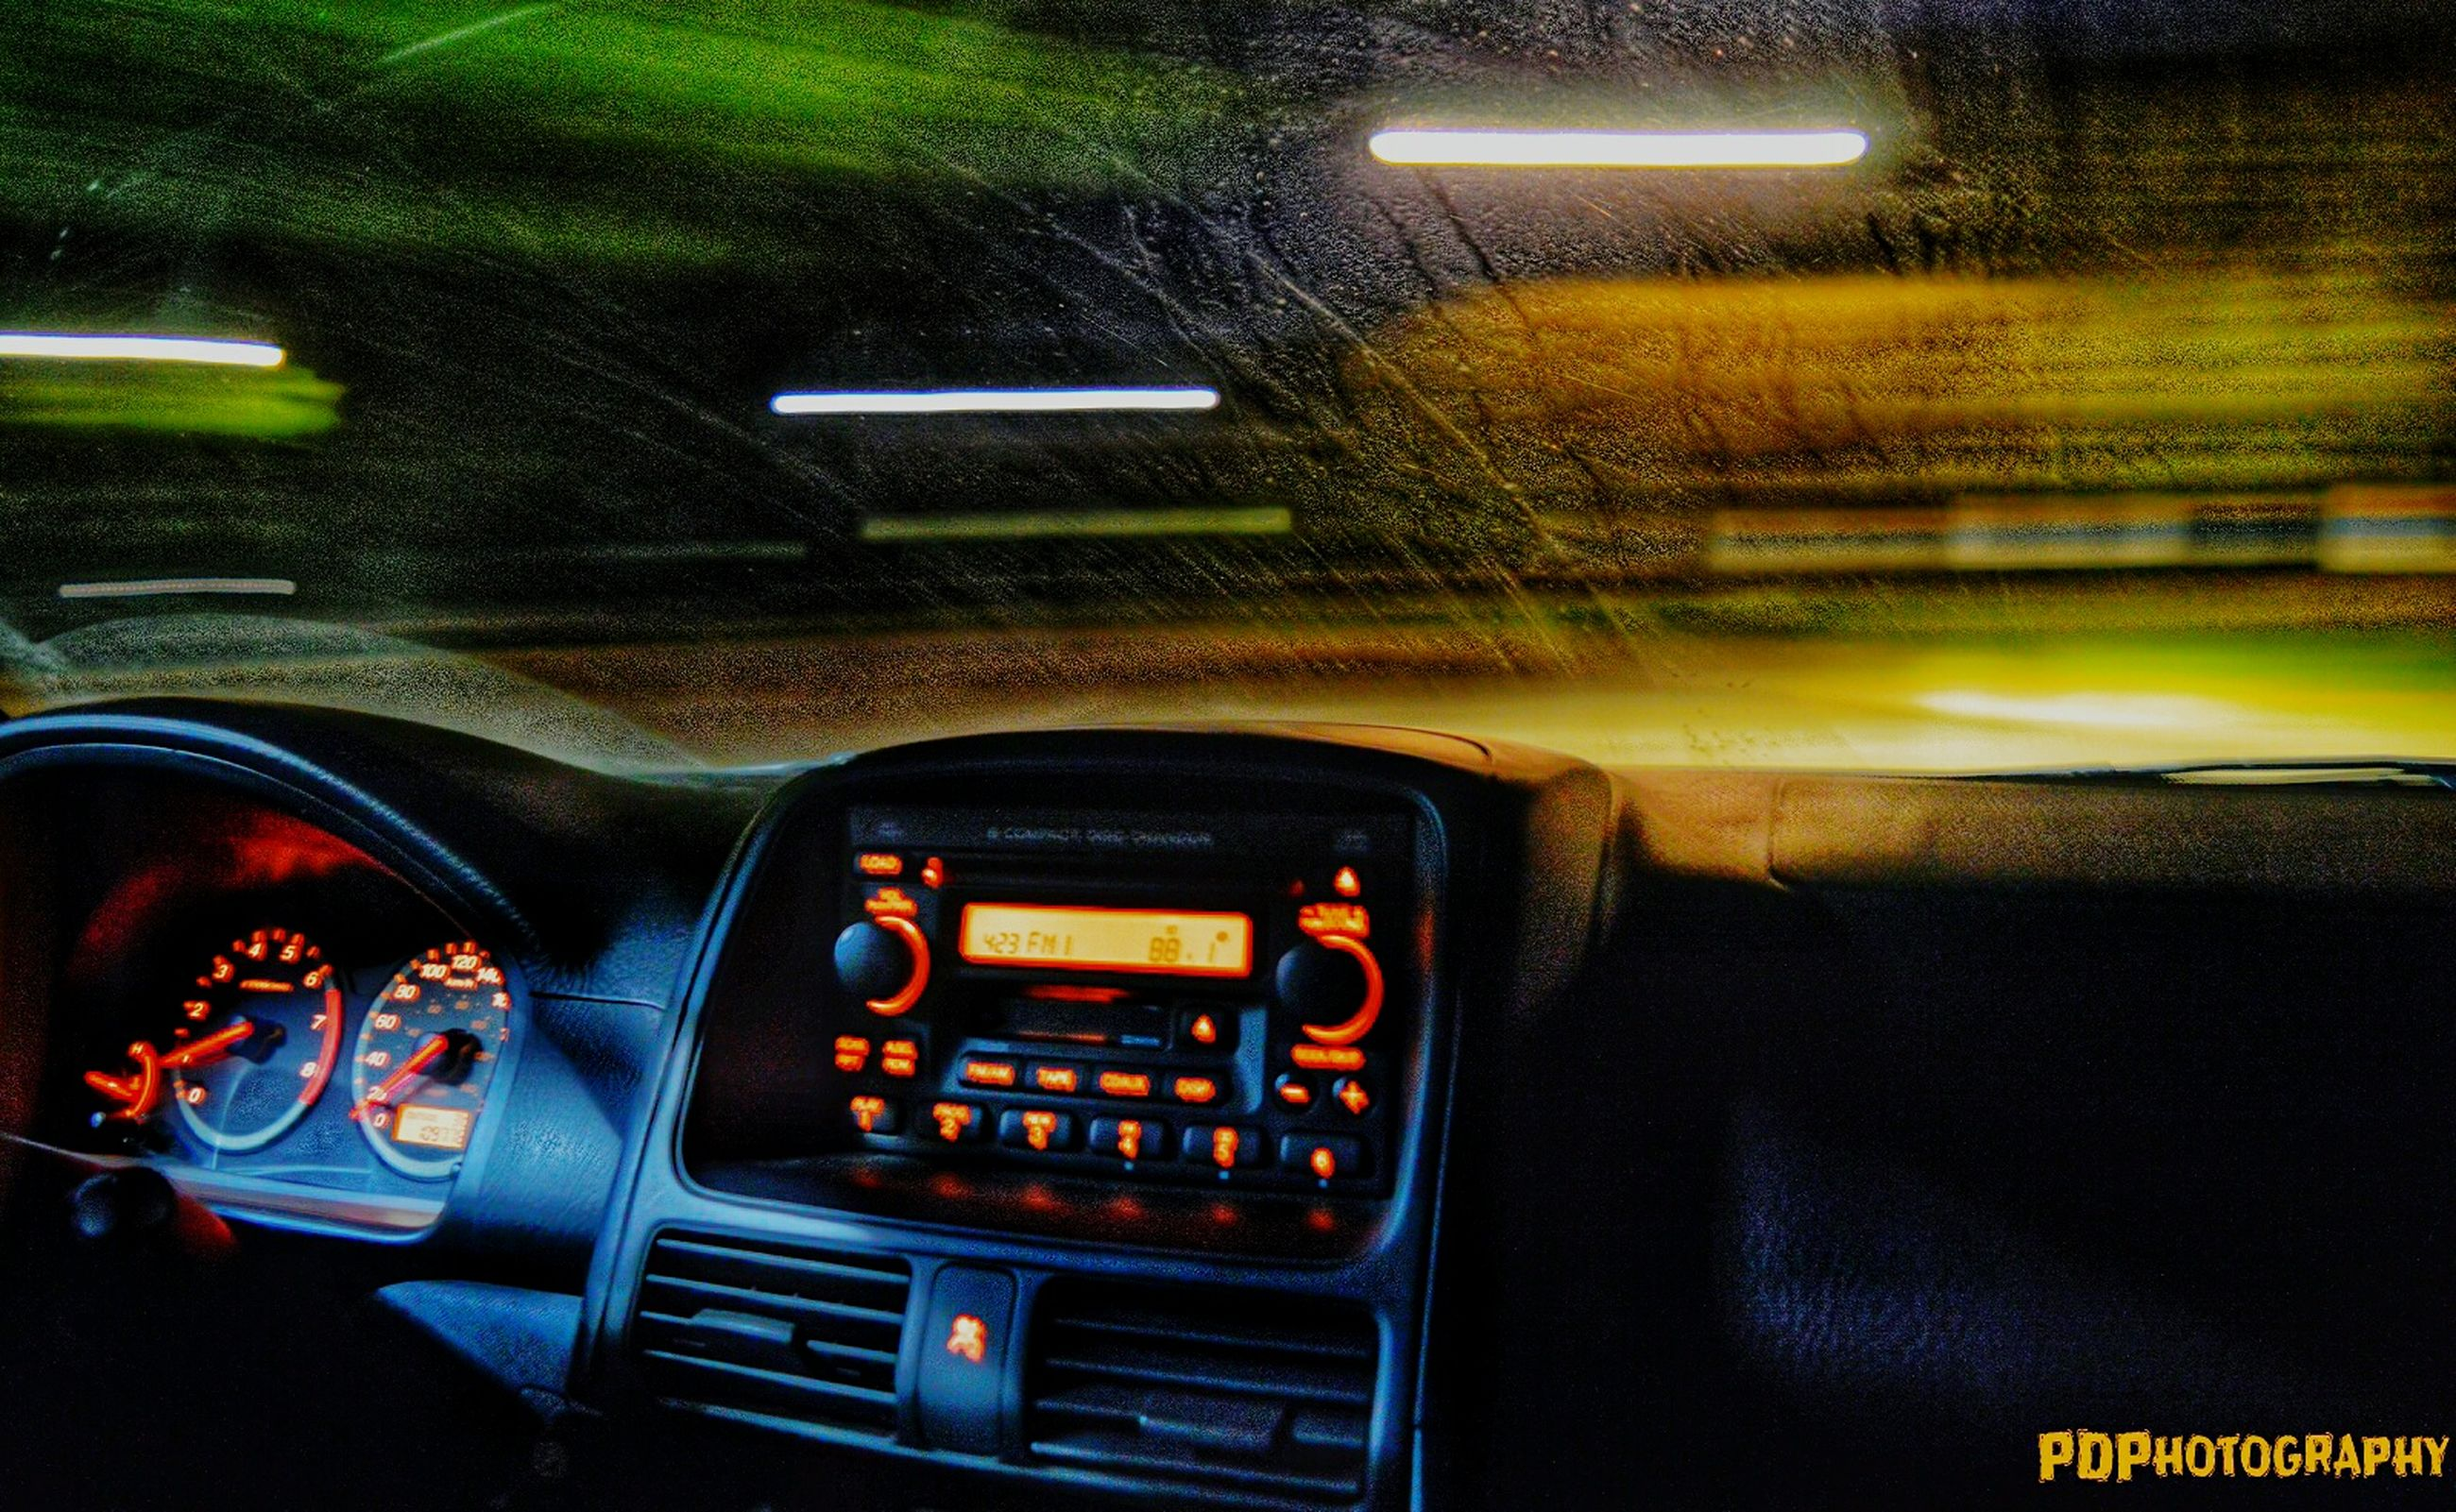 transportation, land vehicle, car, mode of transport, illuminated, night, car interior, vehicle interior, road, windshield, travel, street, dashboard, communication, headlight, close-up, glass - material, no people, technology, part of